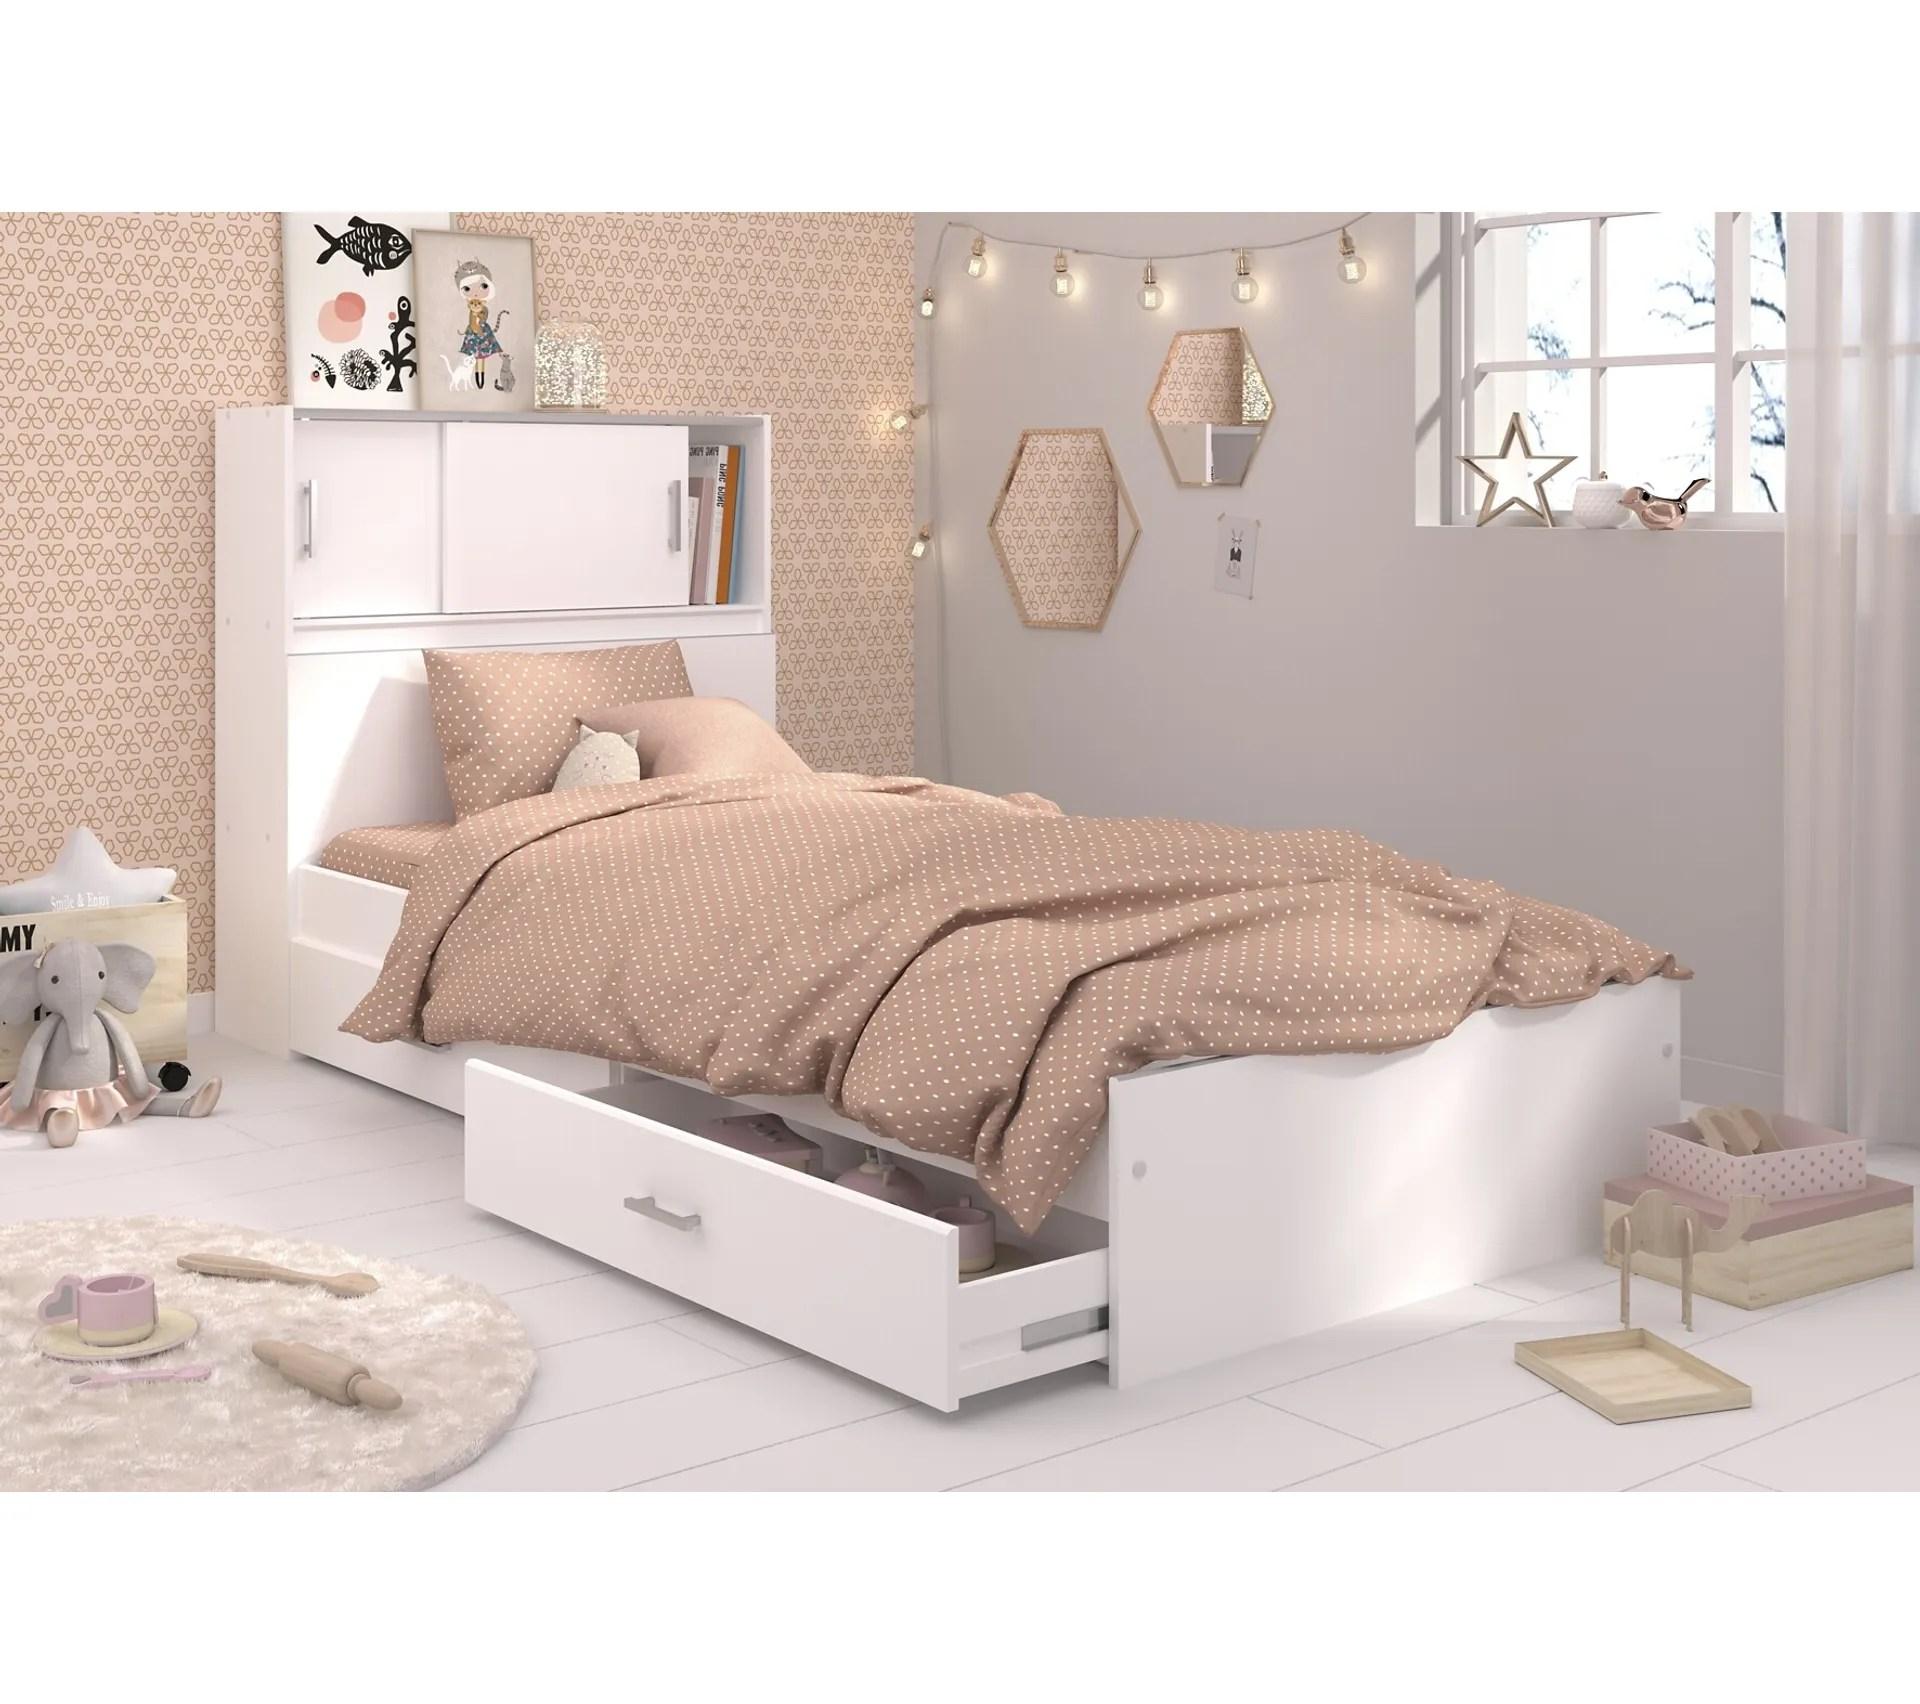 lit blanc avec rangements snoop 90x190 ou 90x200 cm